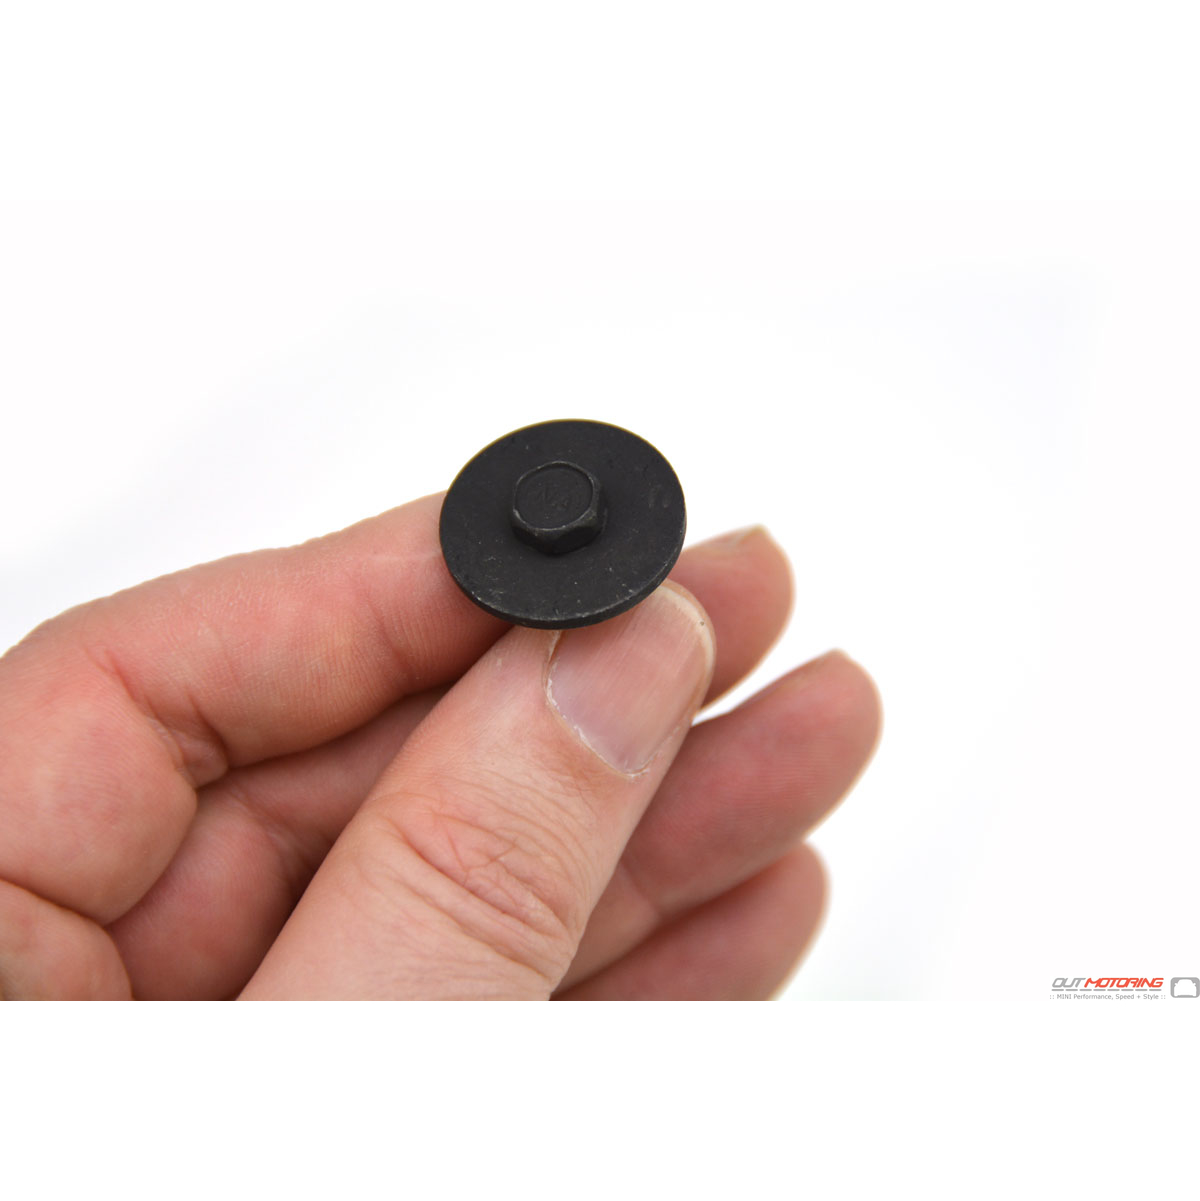 07149213164 Mini Cooper Replacement Parts Hex Bolt